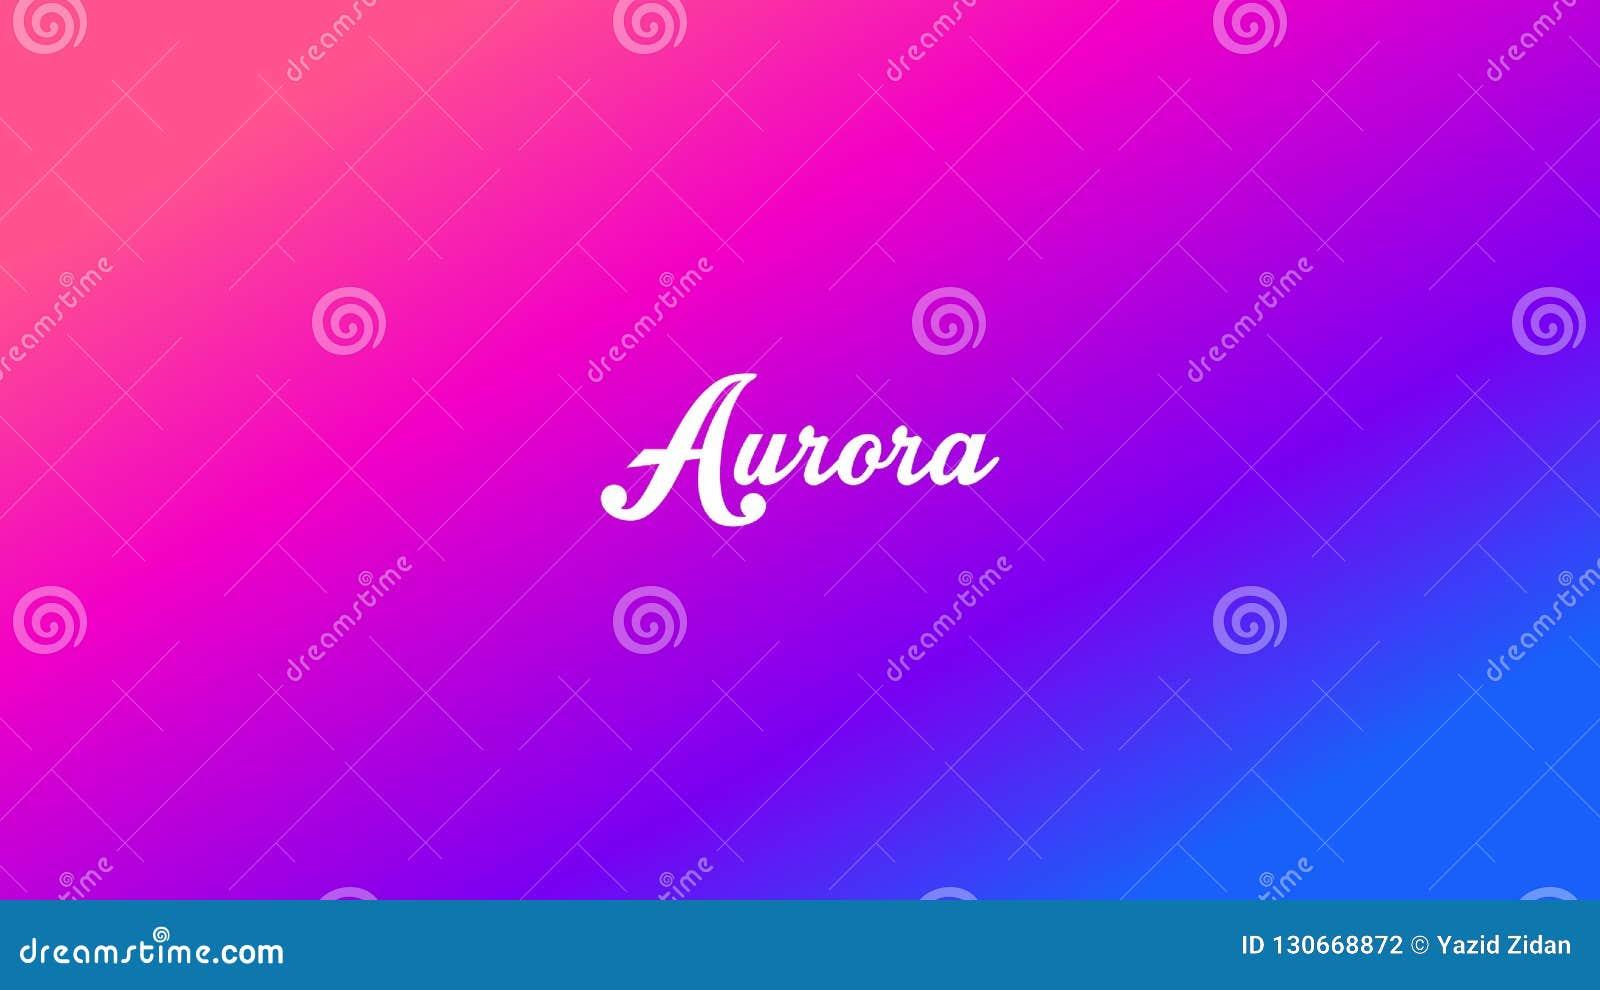 Aurora Gradient Relaxing Wallpaper Background Stock Illustration